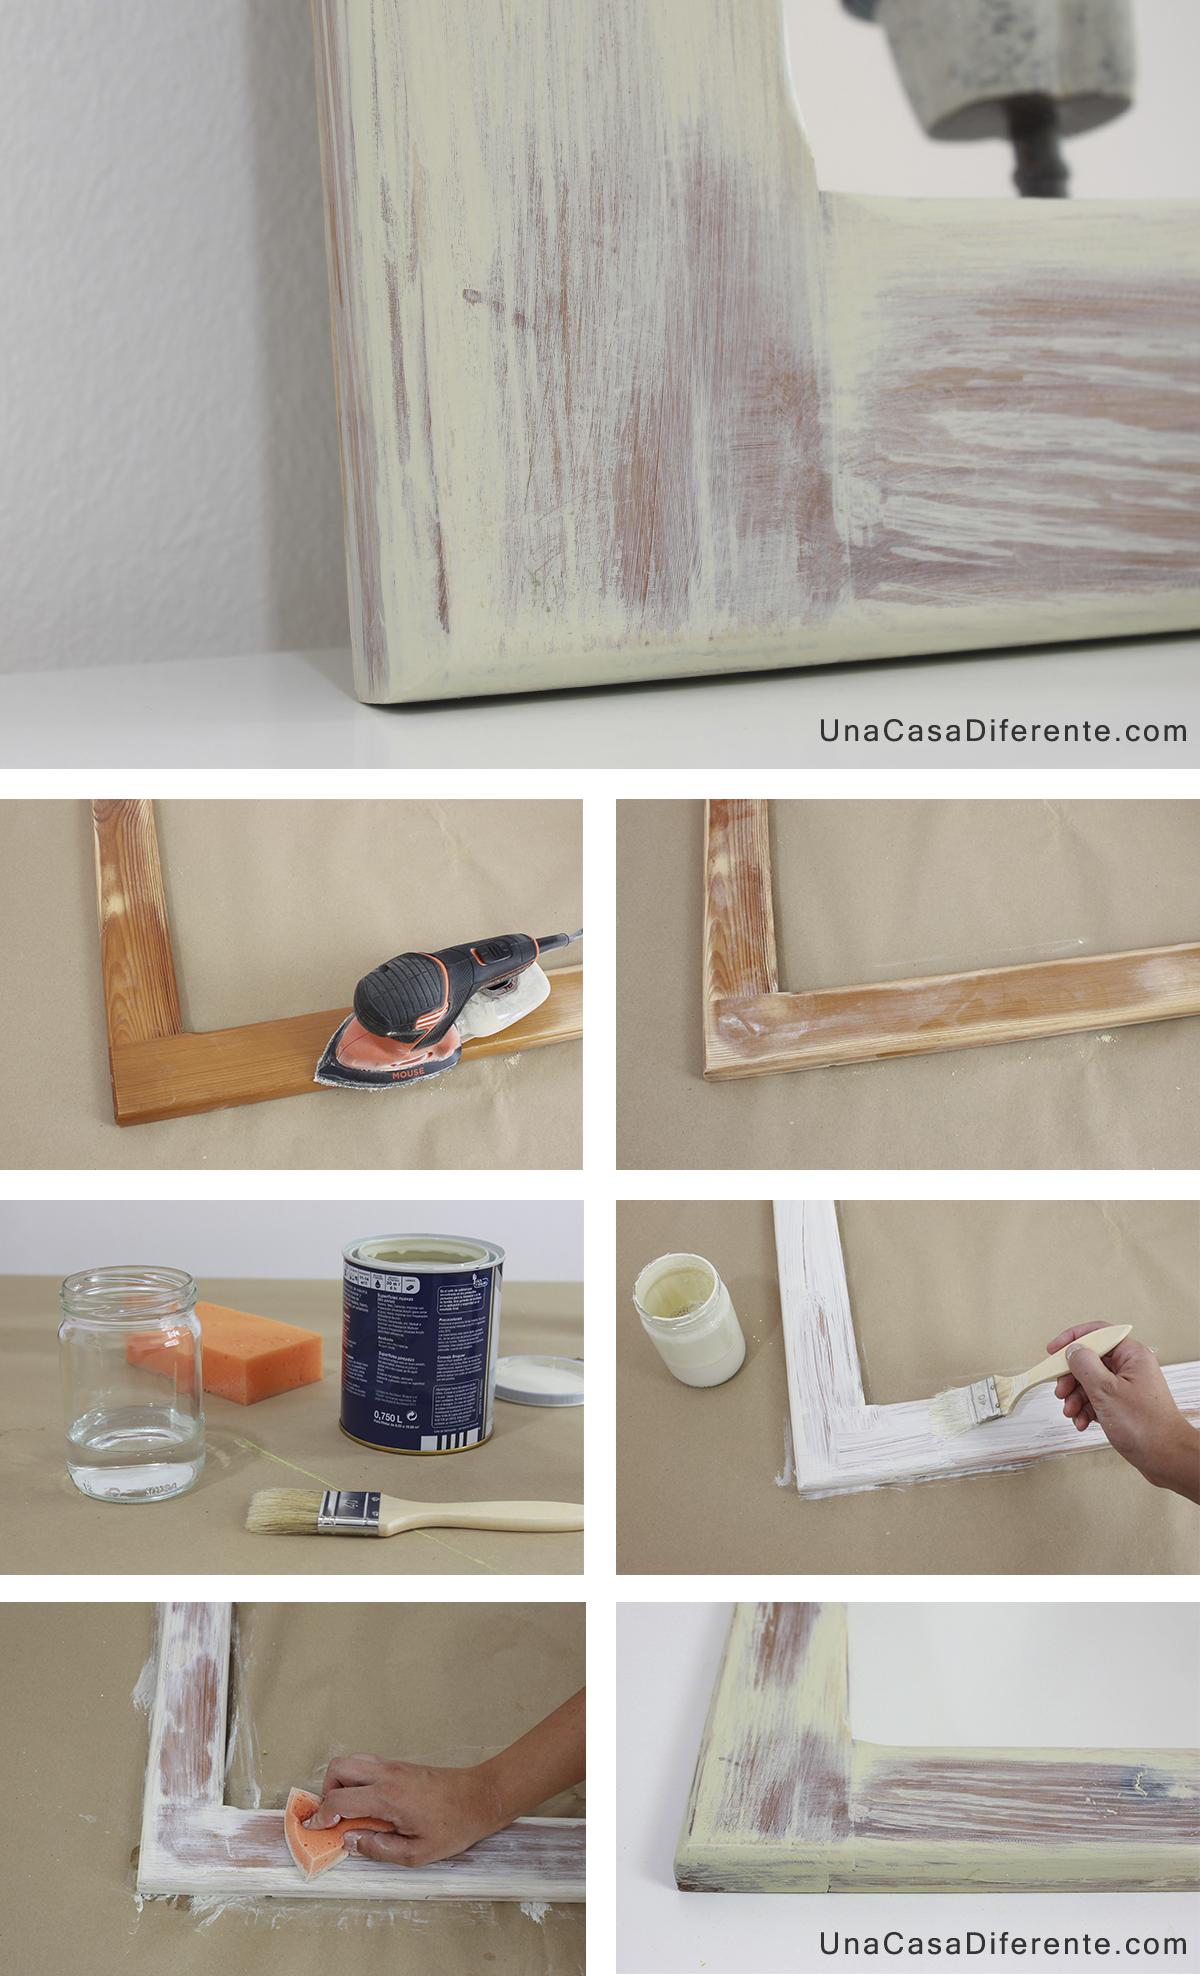 Cómo pintar madera pátina blanca envejecido | arlet | Pinterest ...